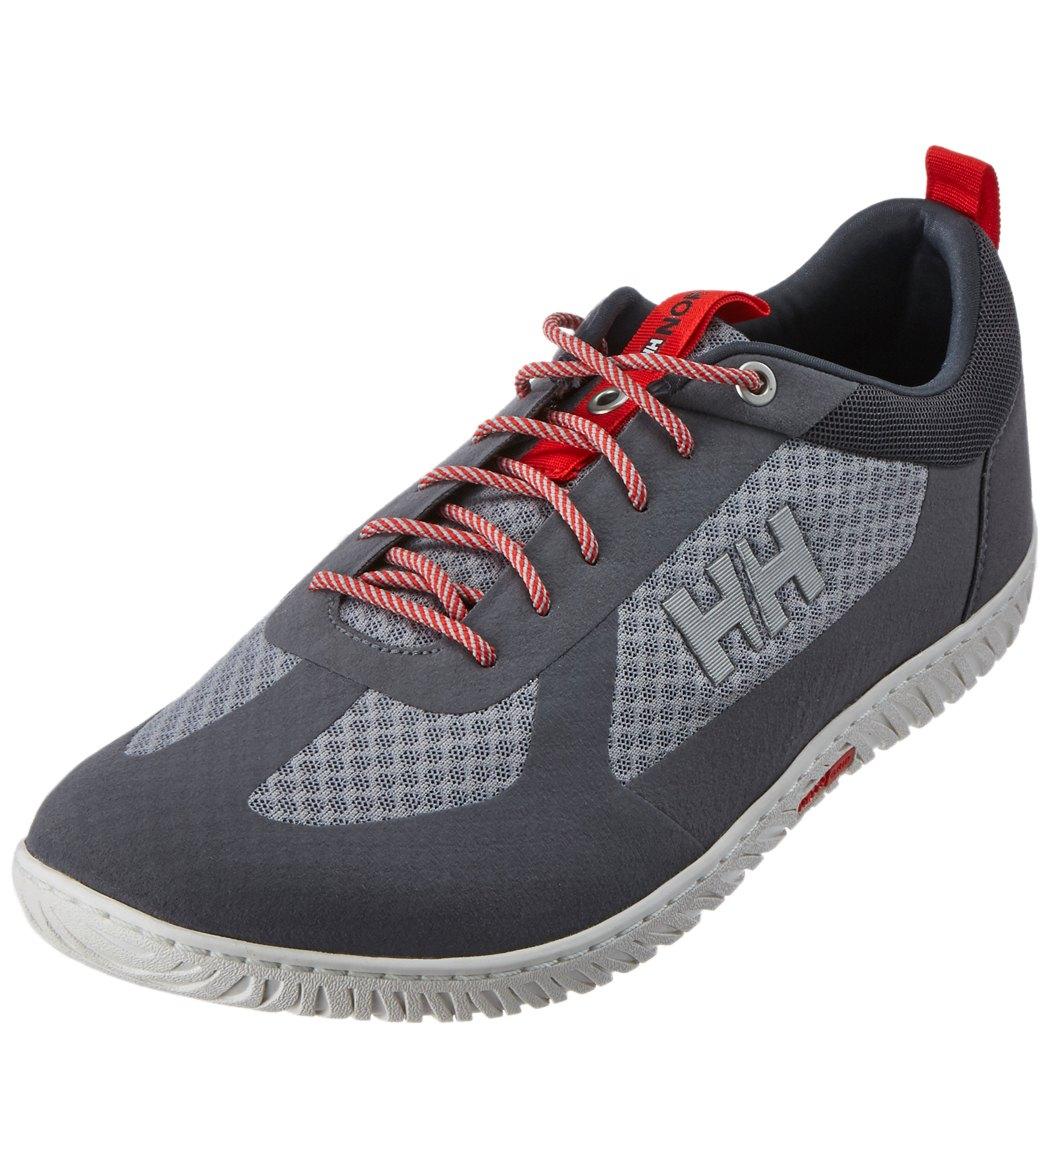 20ee9d4e0a94 Helly Hansen Men s Santiago L20 Water Shoe at SwimOutlet.com - Free Shipping